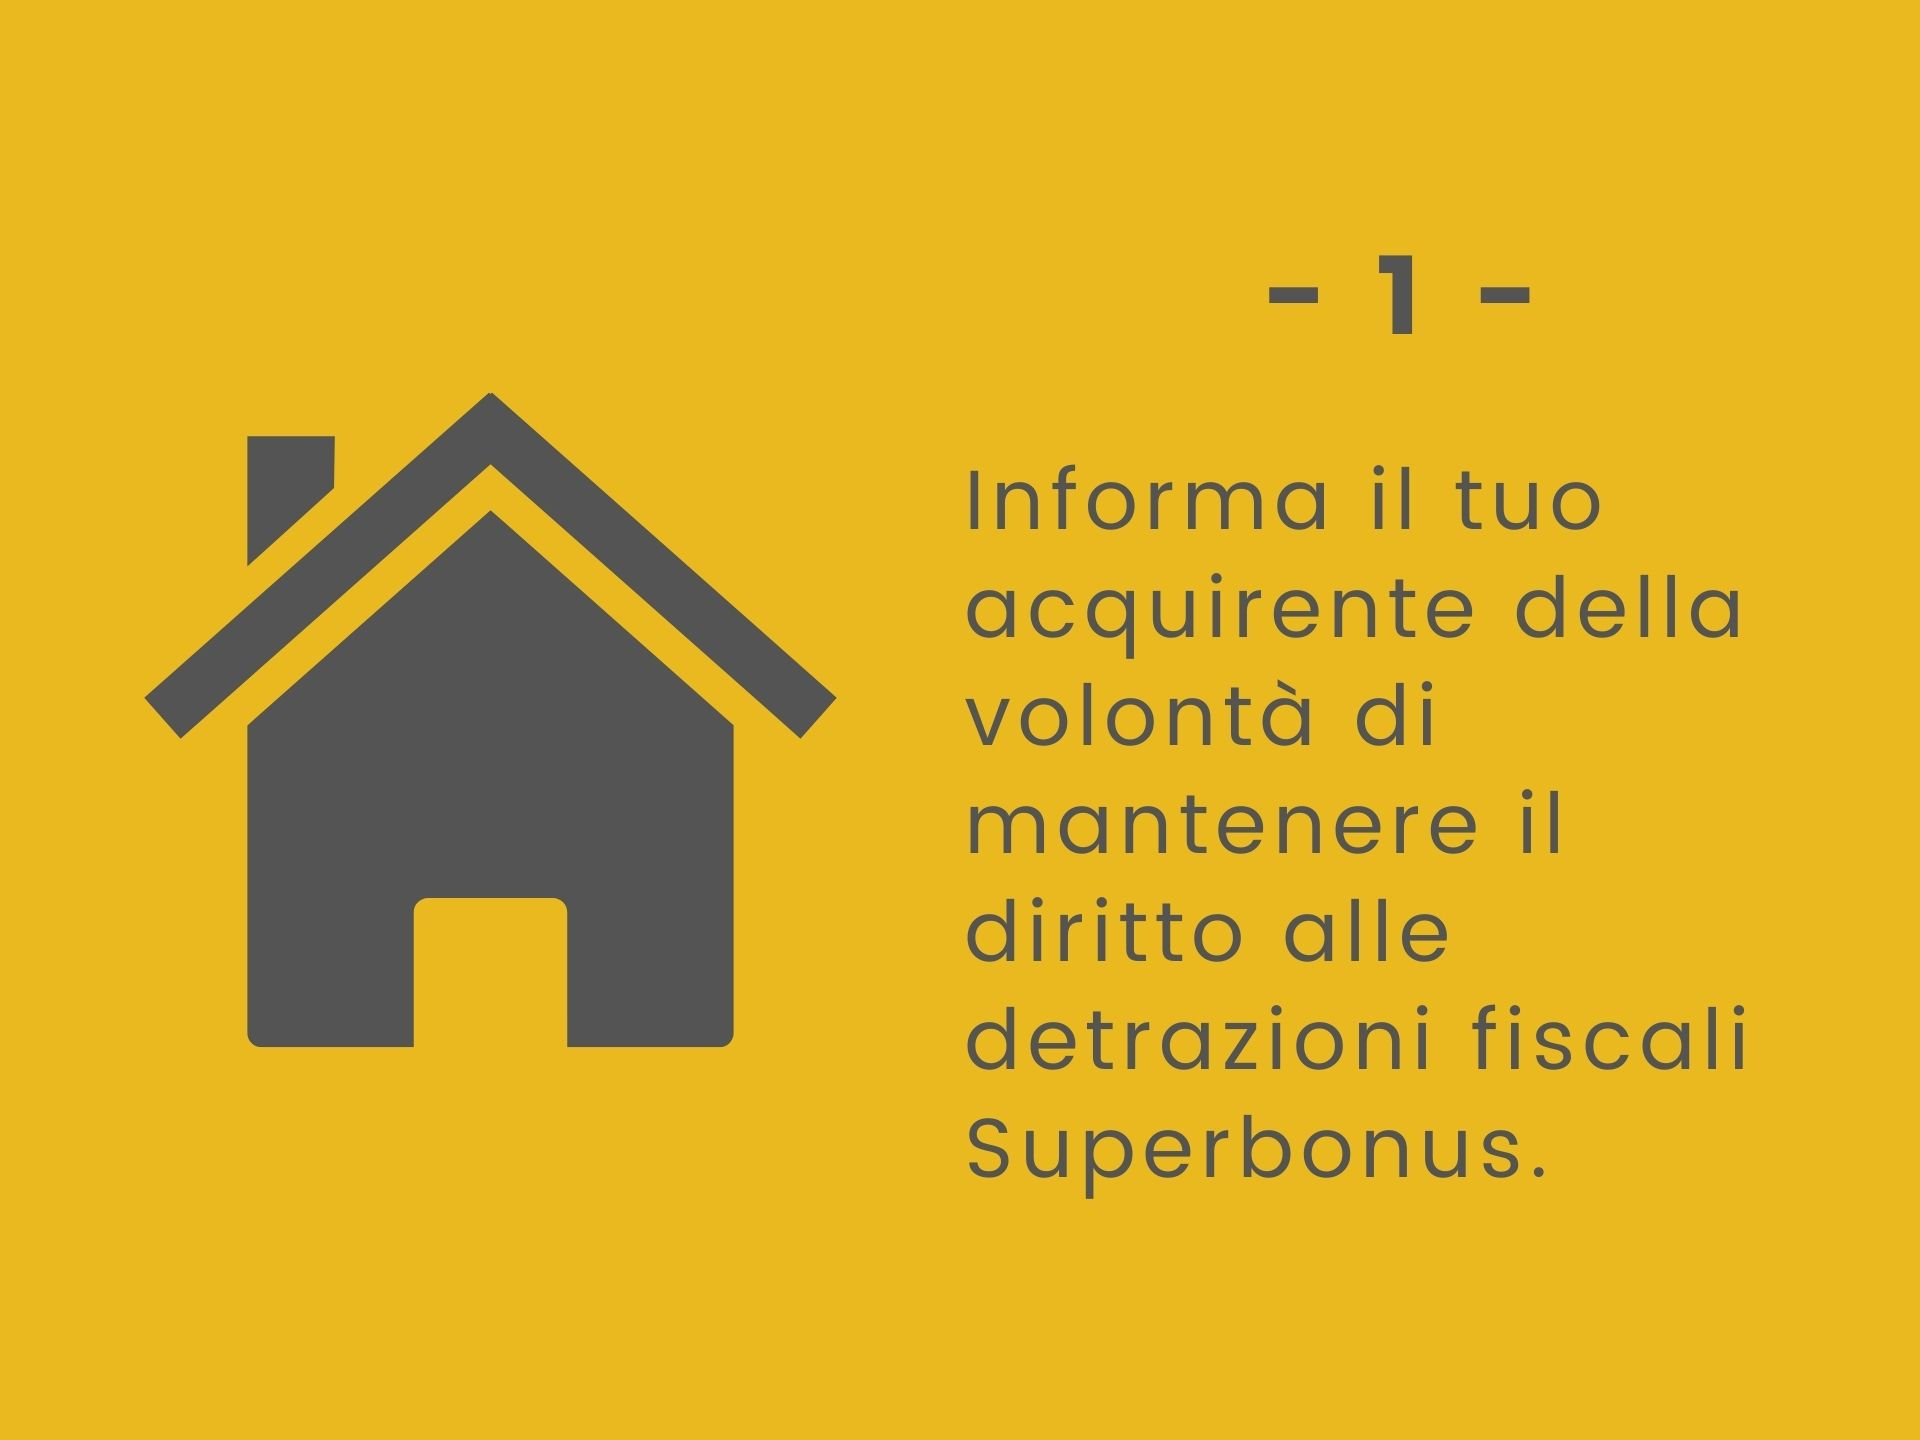 vendo-casa-perdo-le-agevolazioni-superbonus-110